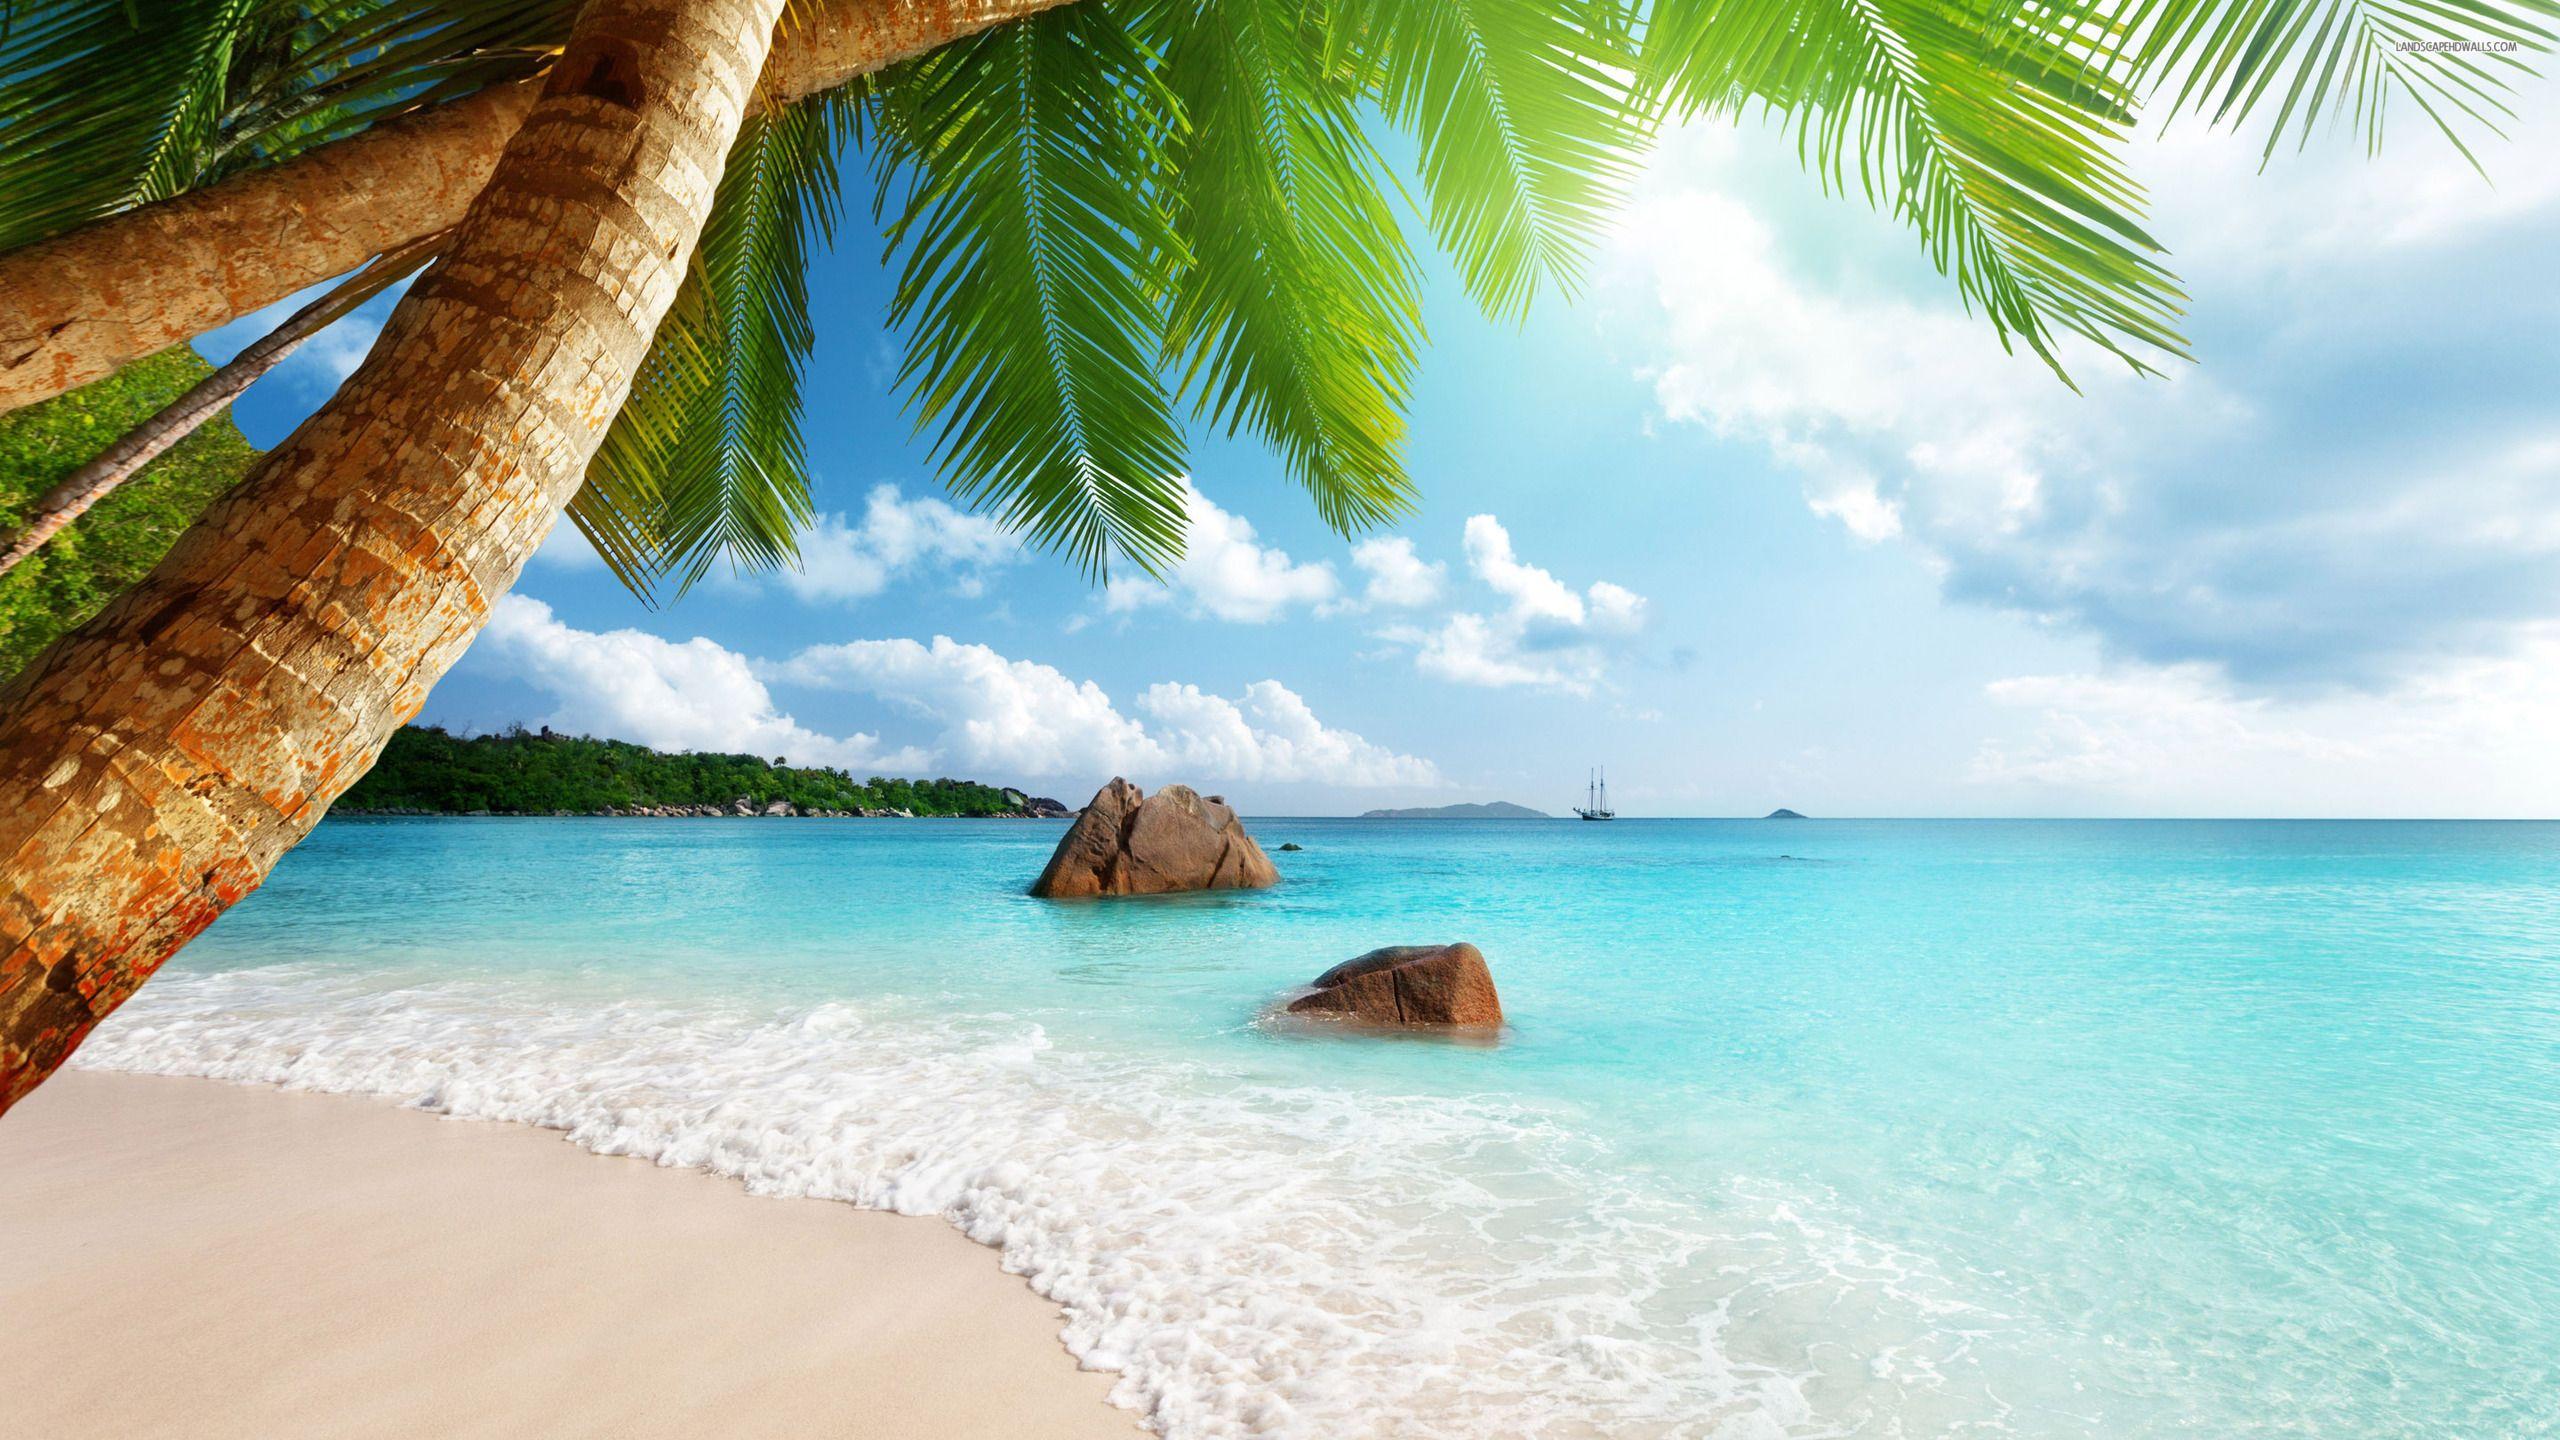 beach wallpaper 1600 x 900 | lugares para visitar | pinterest